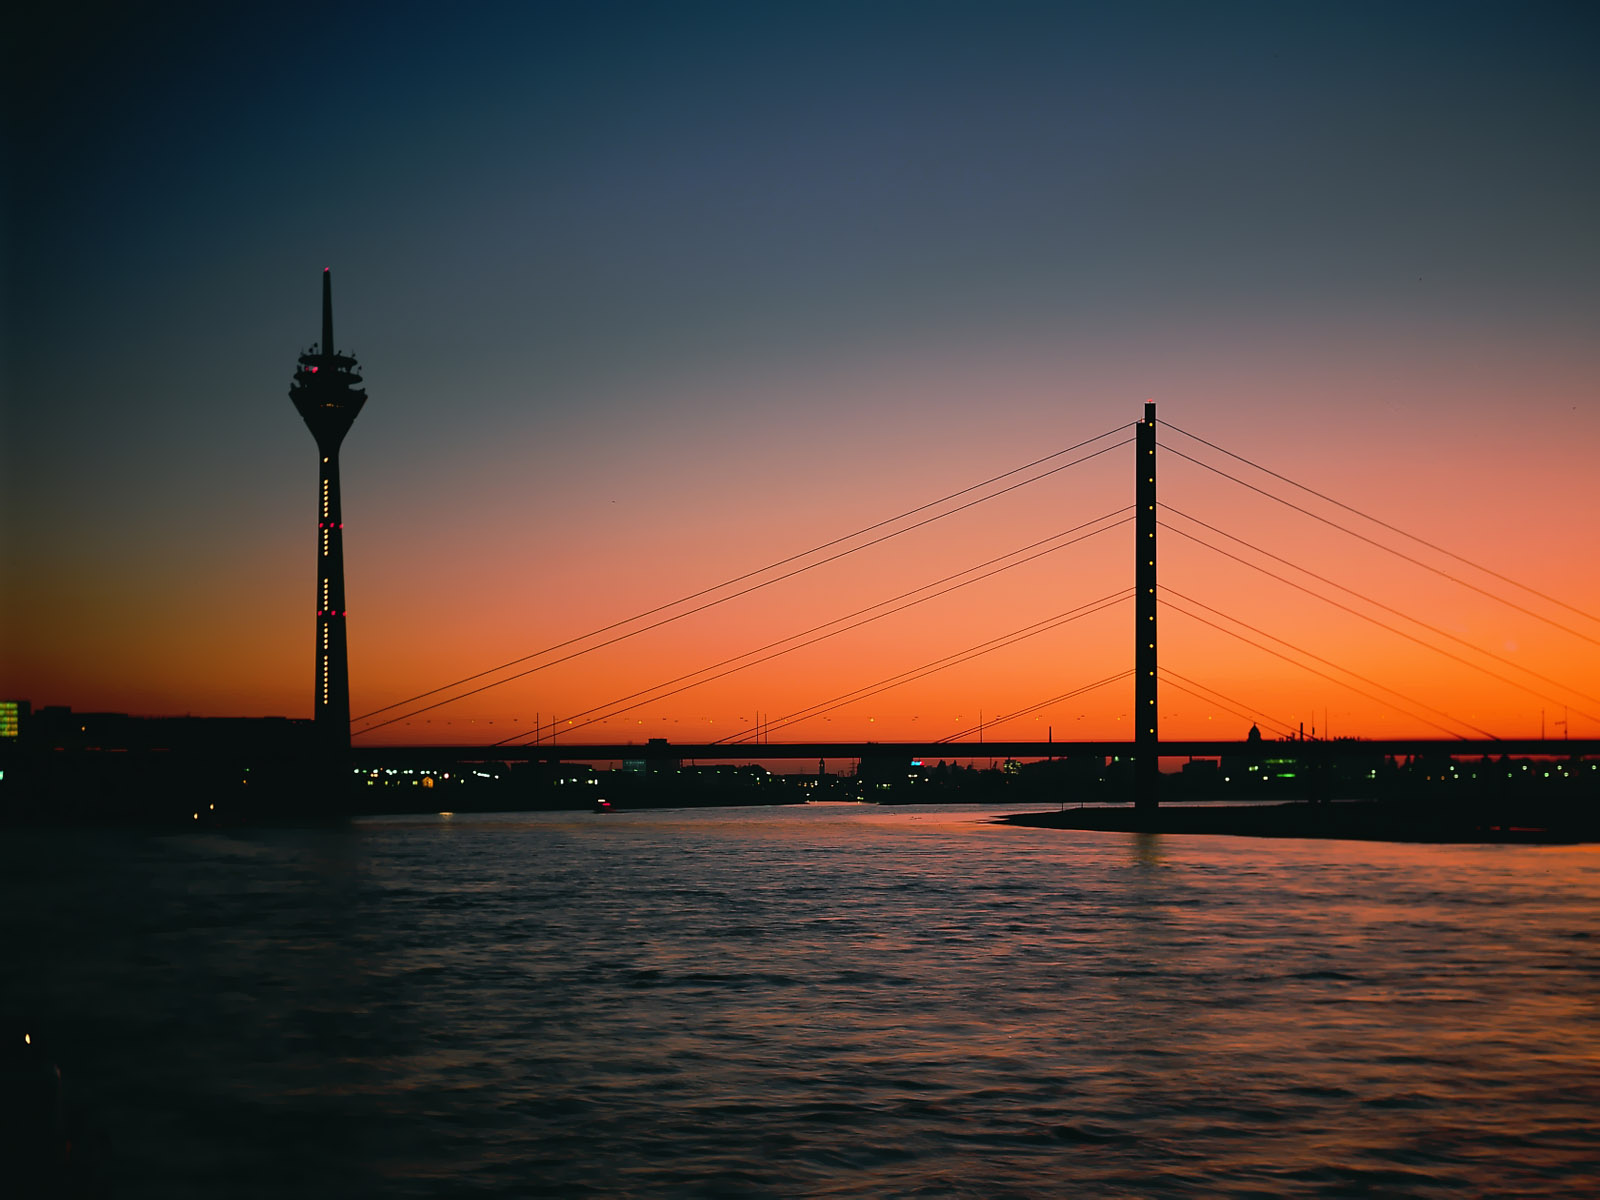 http://4.bp.blogspot.com/_dzEpMszKD6Y/TSIQExA3BeI/AAAAAAAABOc/DDd0J3aEv2o/s1600/City+Night+Scenes+Wallpapers+16.jpg